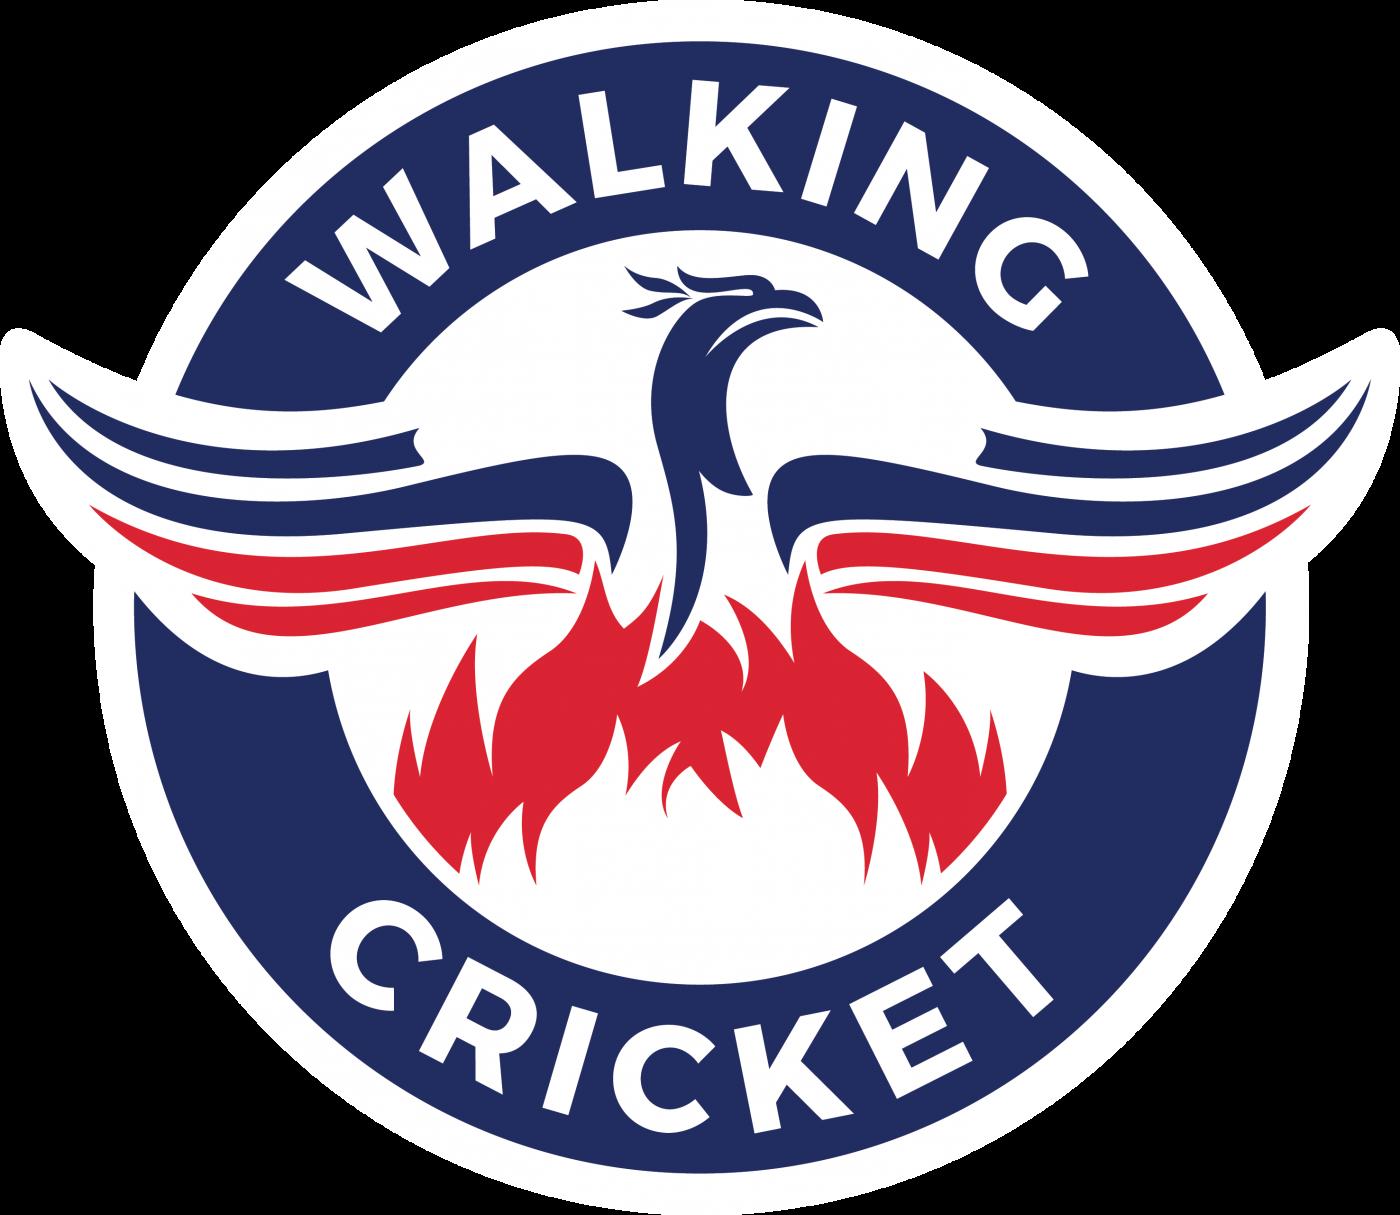 Walking Cricket Rules